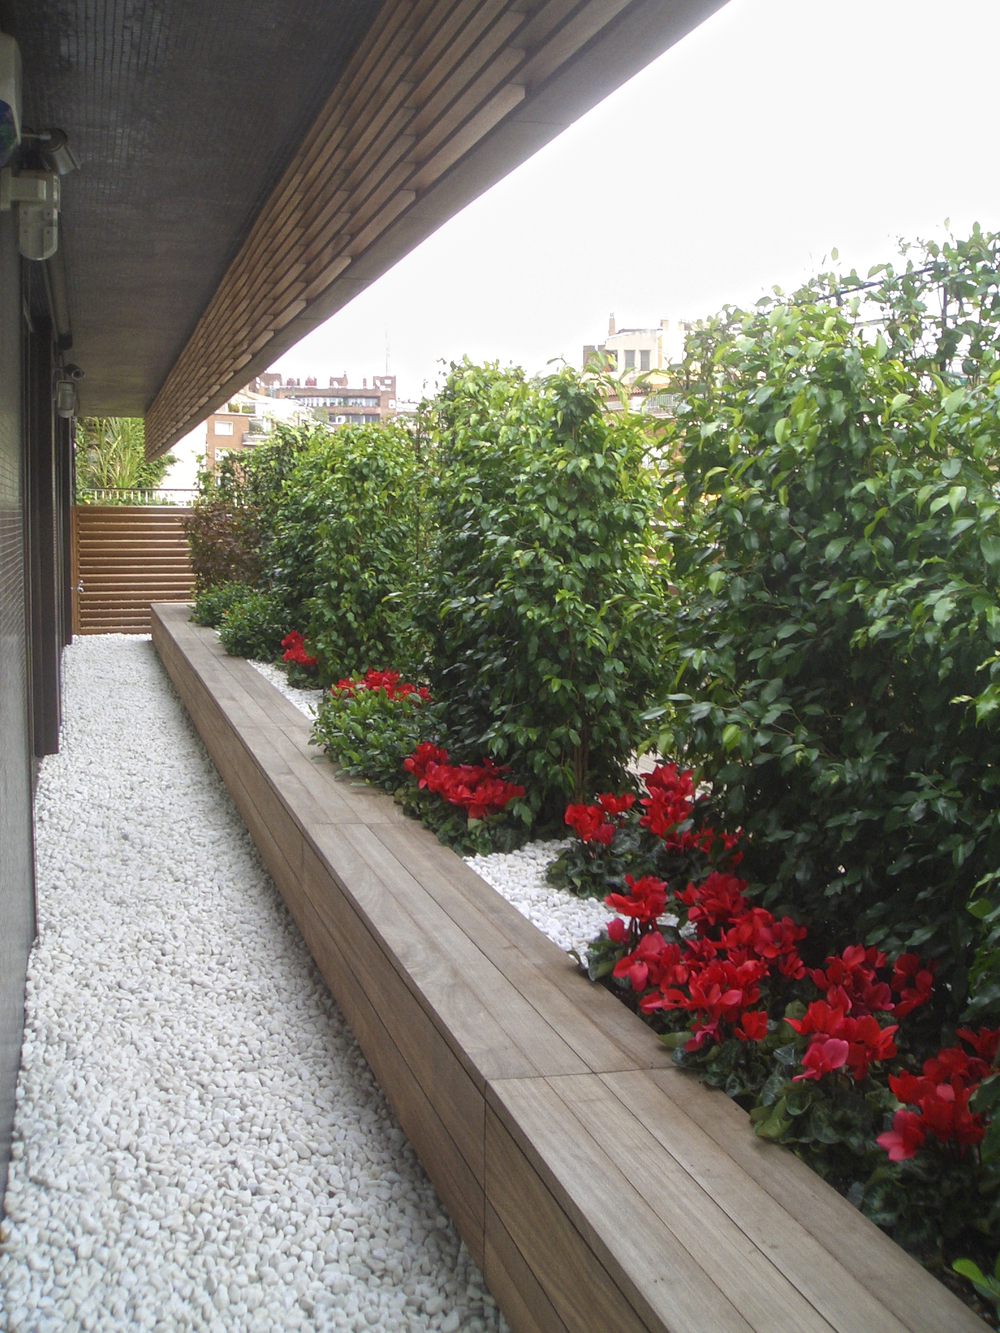 Aeland - Paisajismo - Landscape - Barcelona - Garden - Jardin